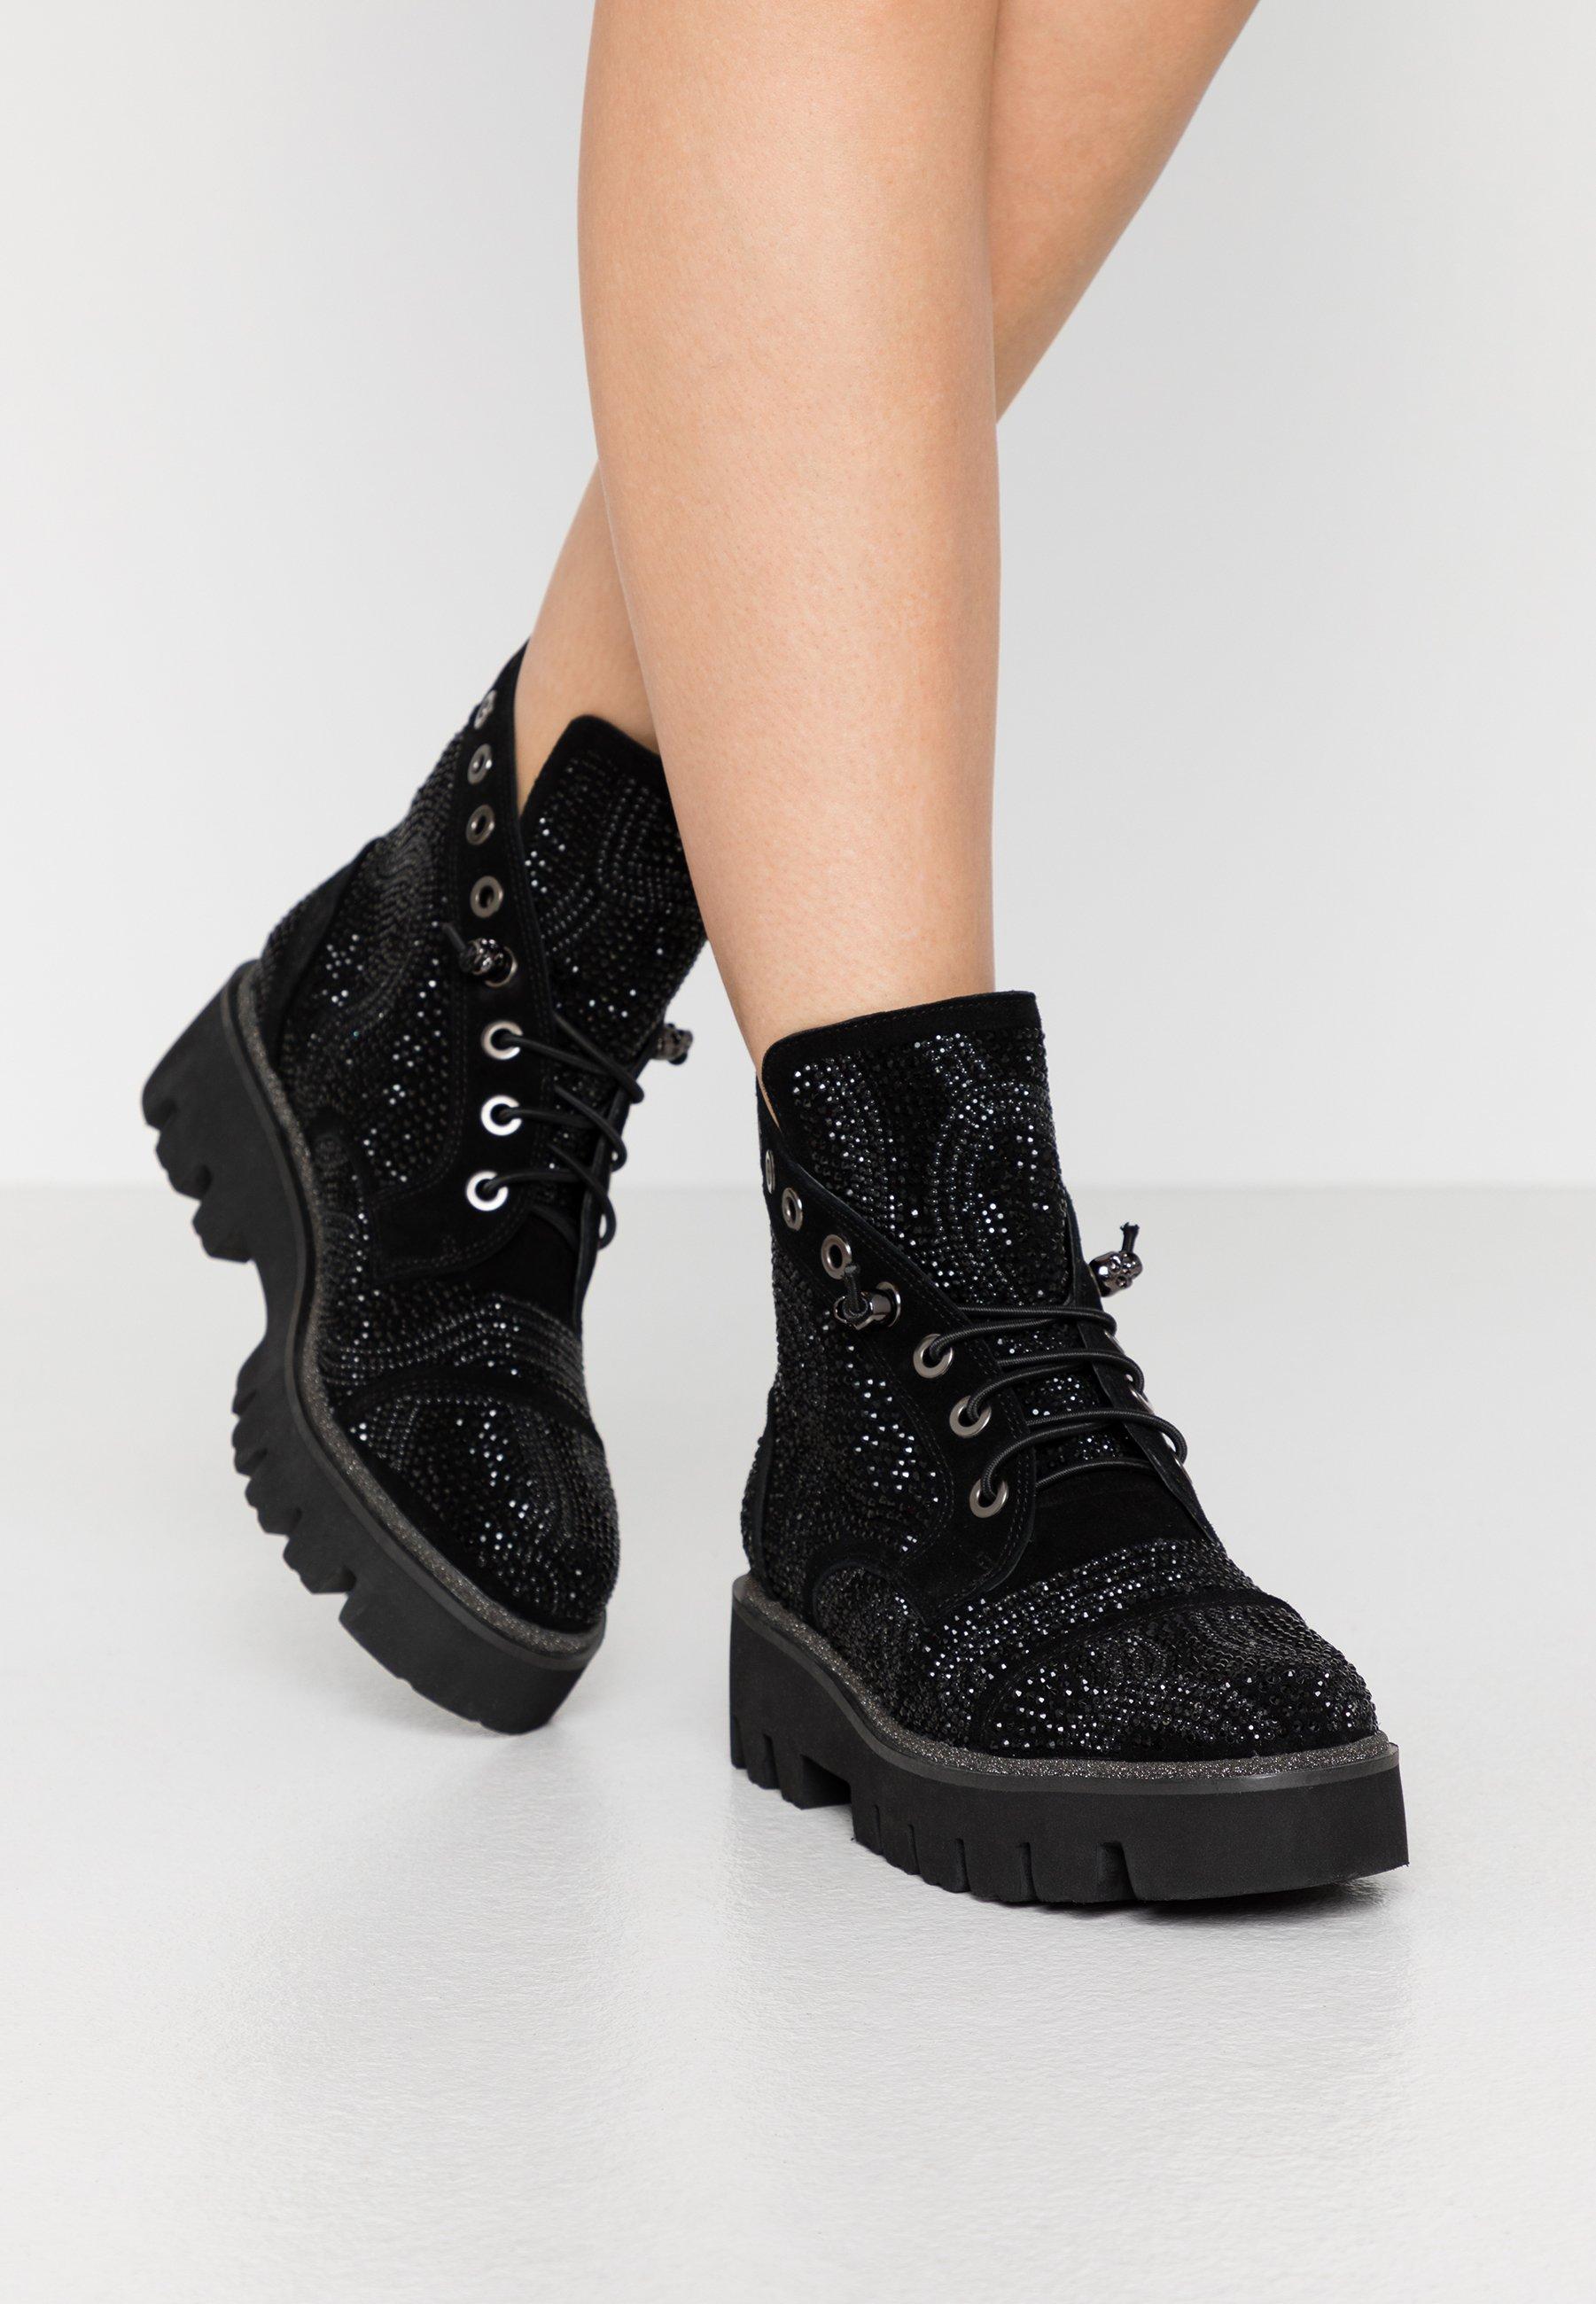 práctica Historiador Descortés  Alma en Pena Platform ankle boots - black - Zalando.de